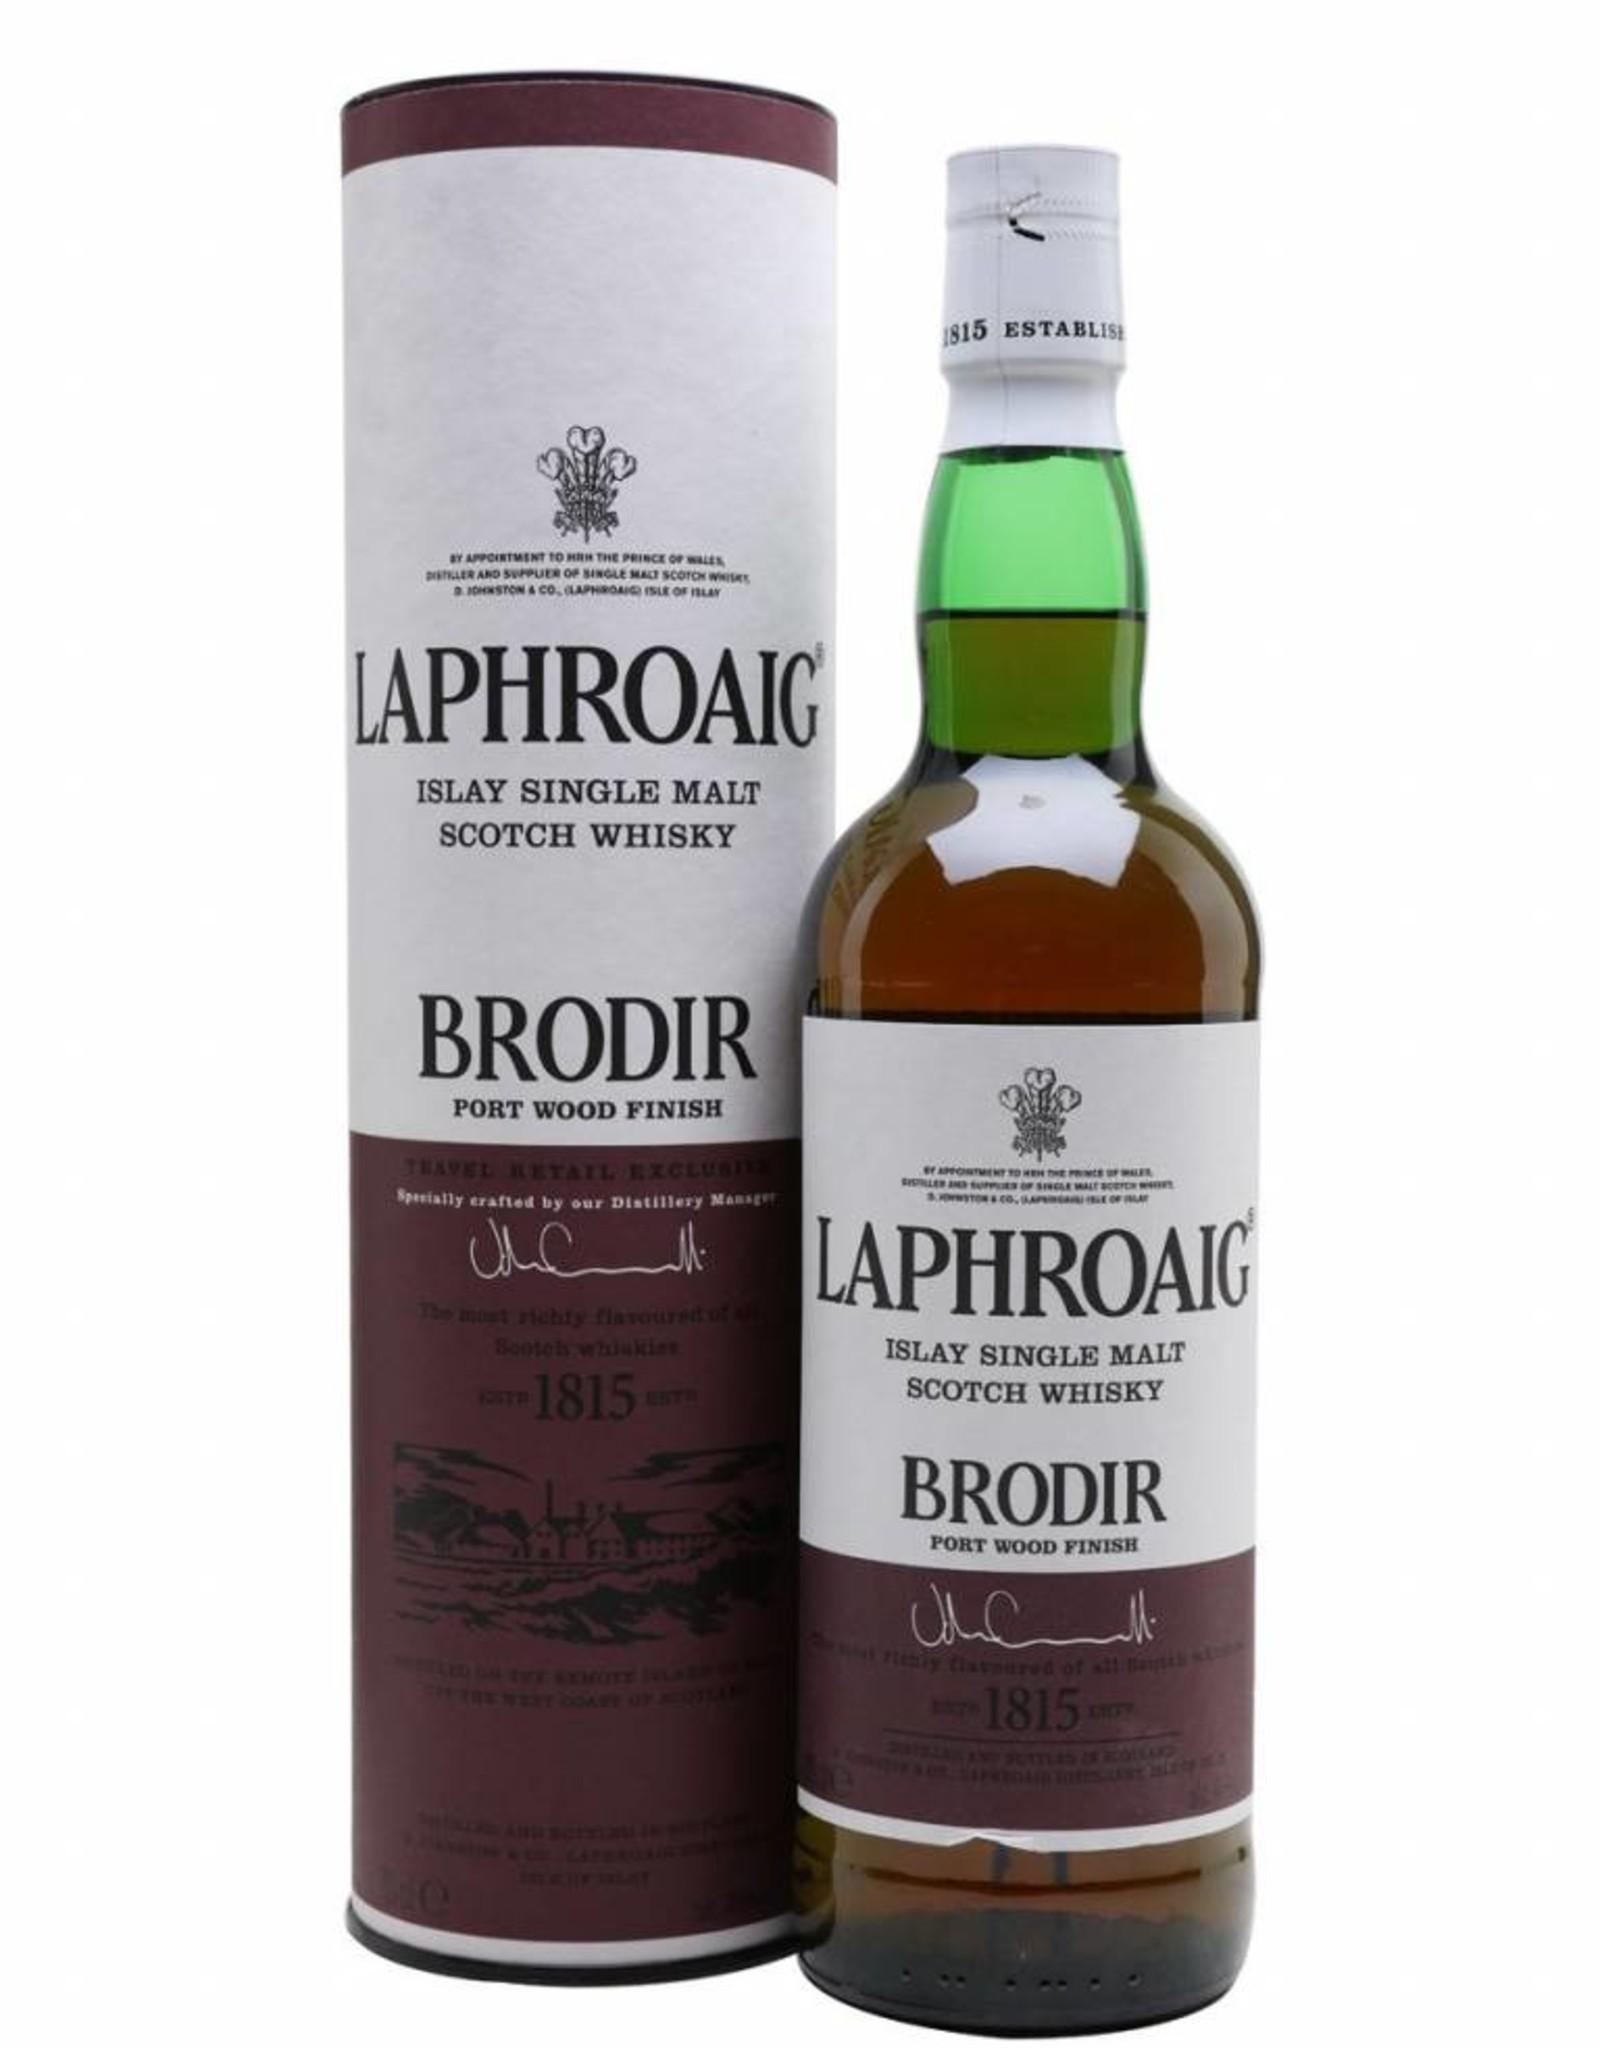 Laphroaig Brodir Batch 2, whisky, 48%, 700 ml